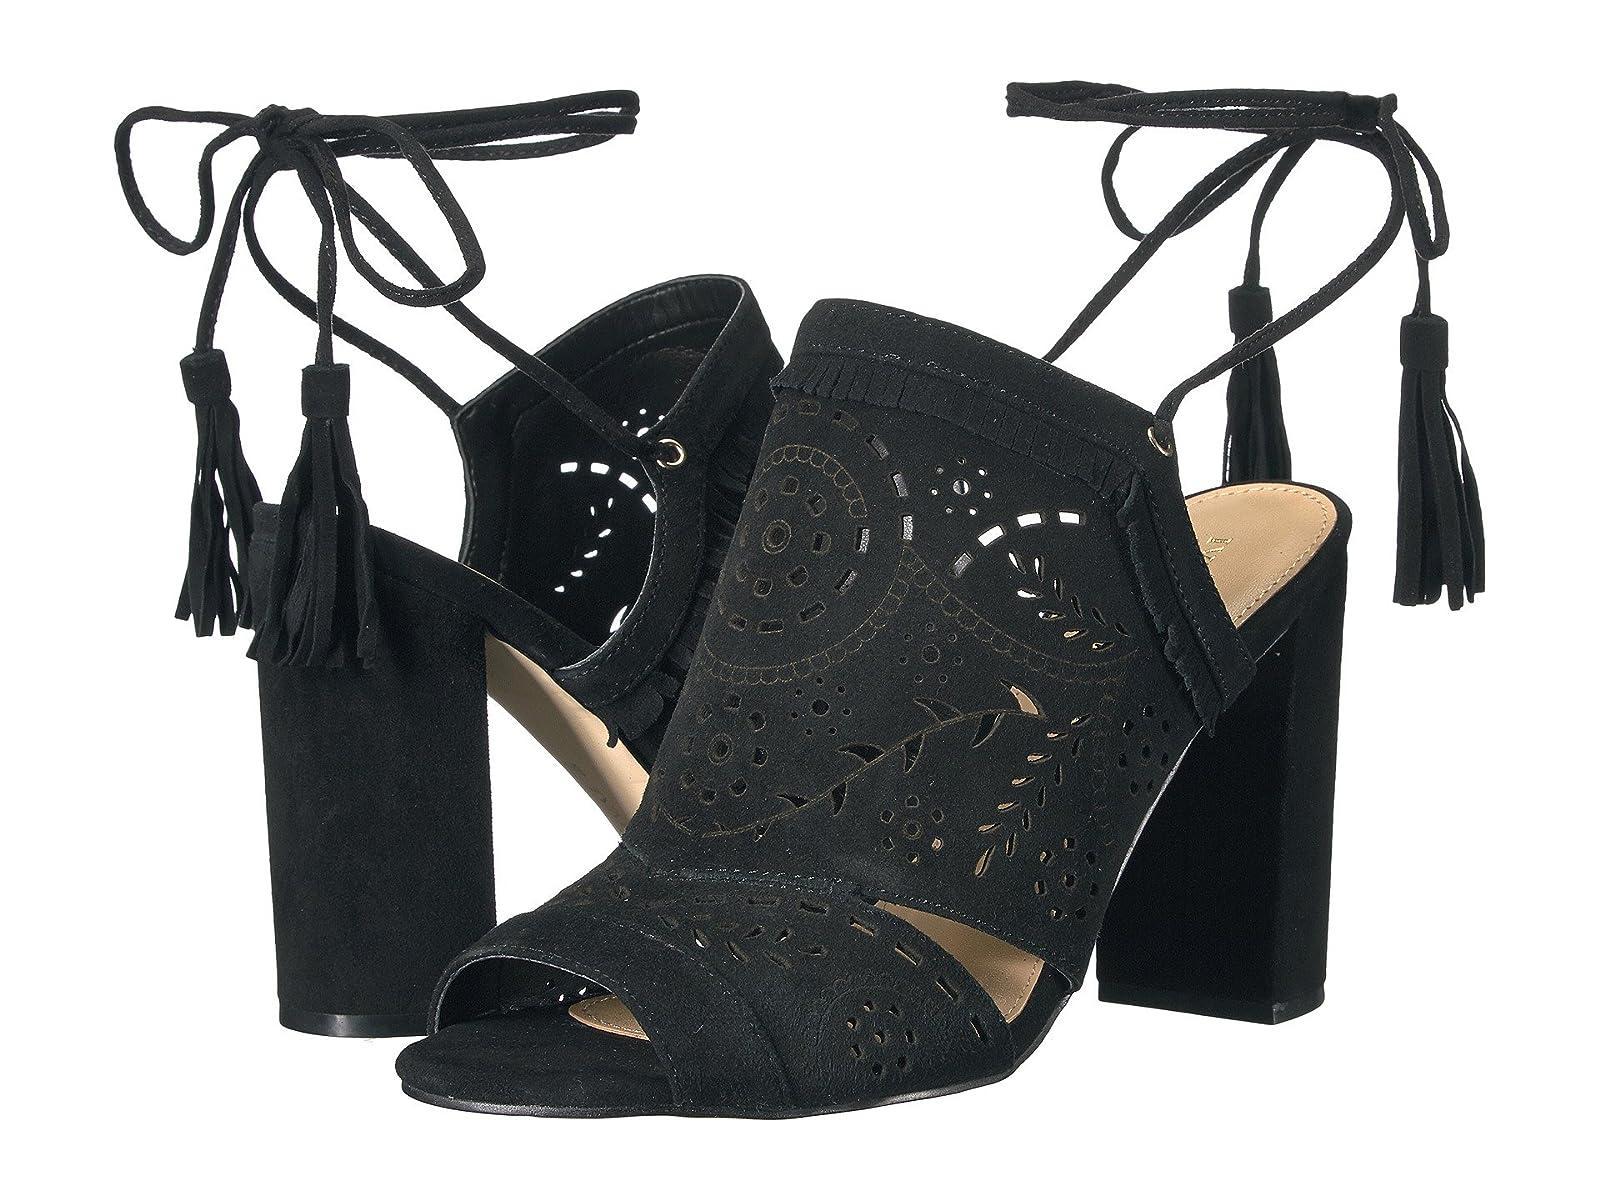 Ivanka Trump KarahCheap and distinctive eye-catching shoes